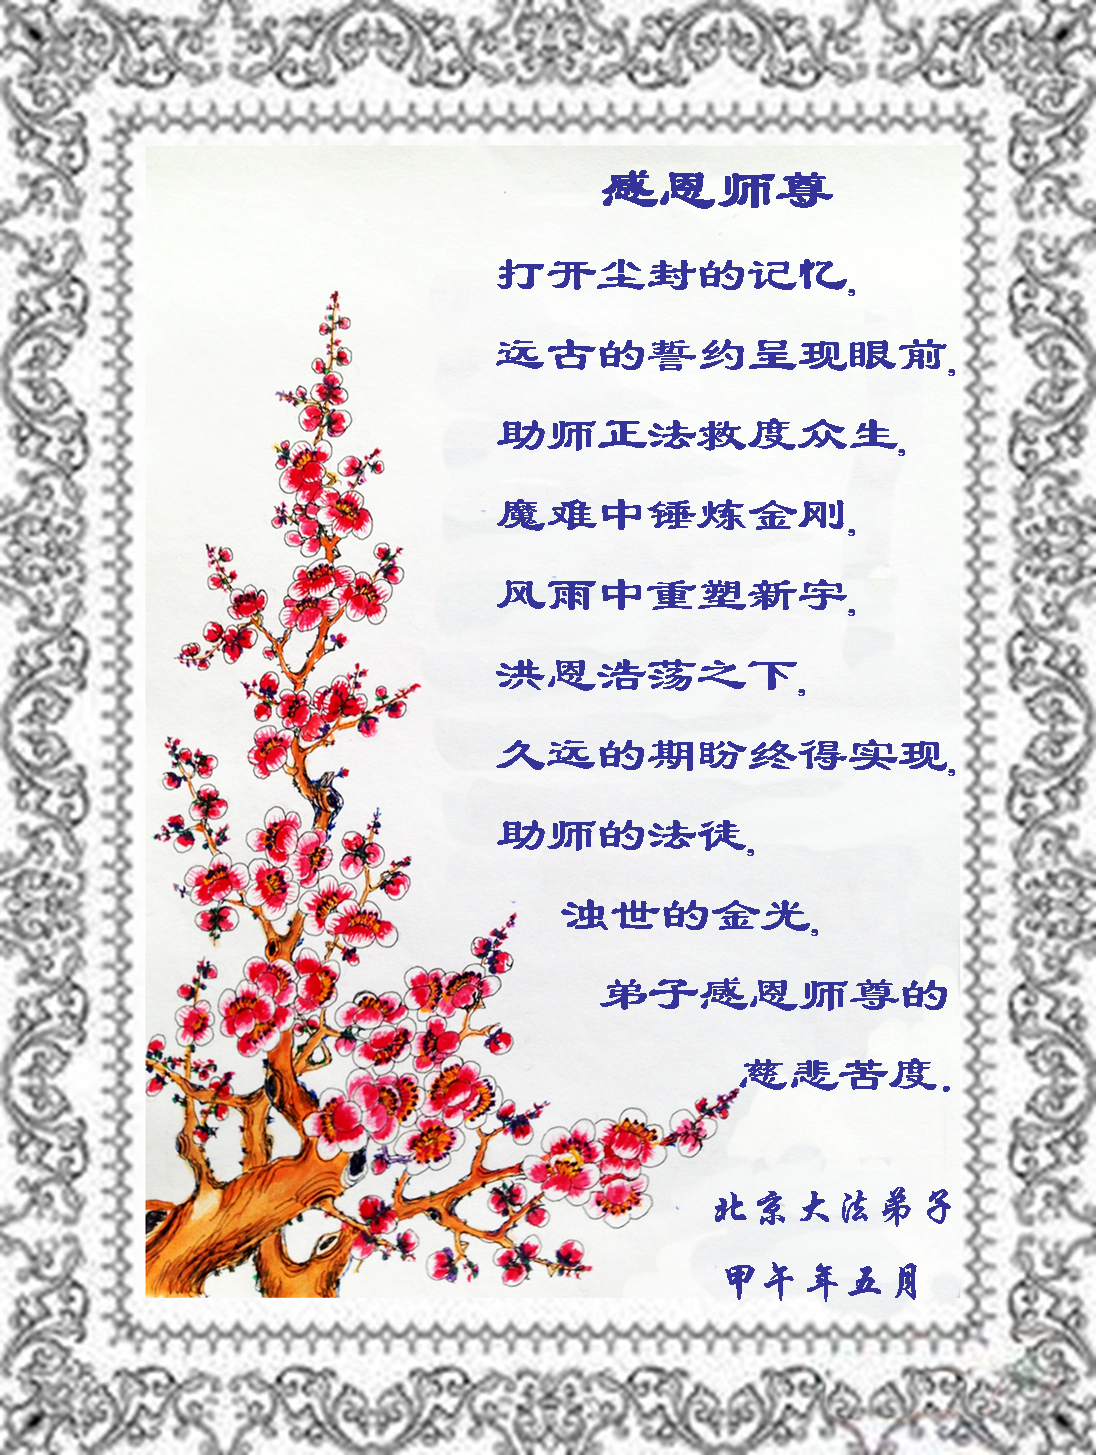 Falun Dafa Practitioners In Beijing China Celebrate The 22nd